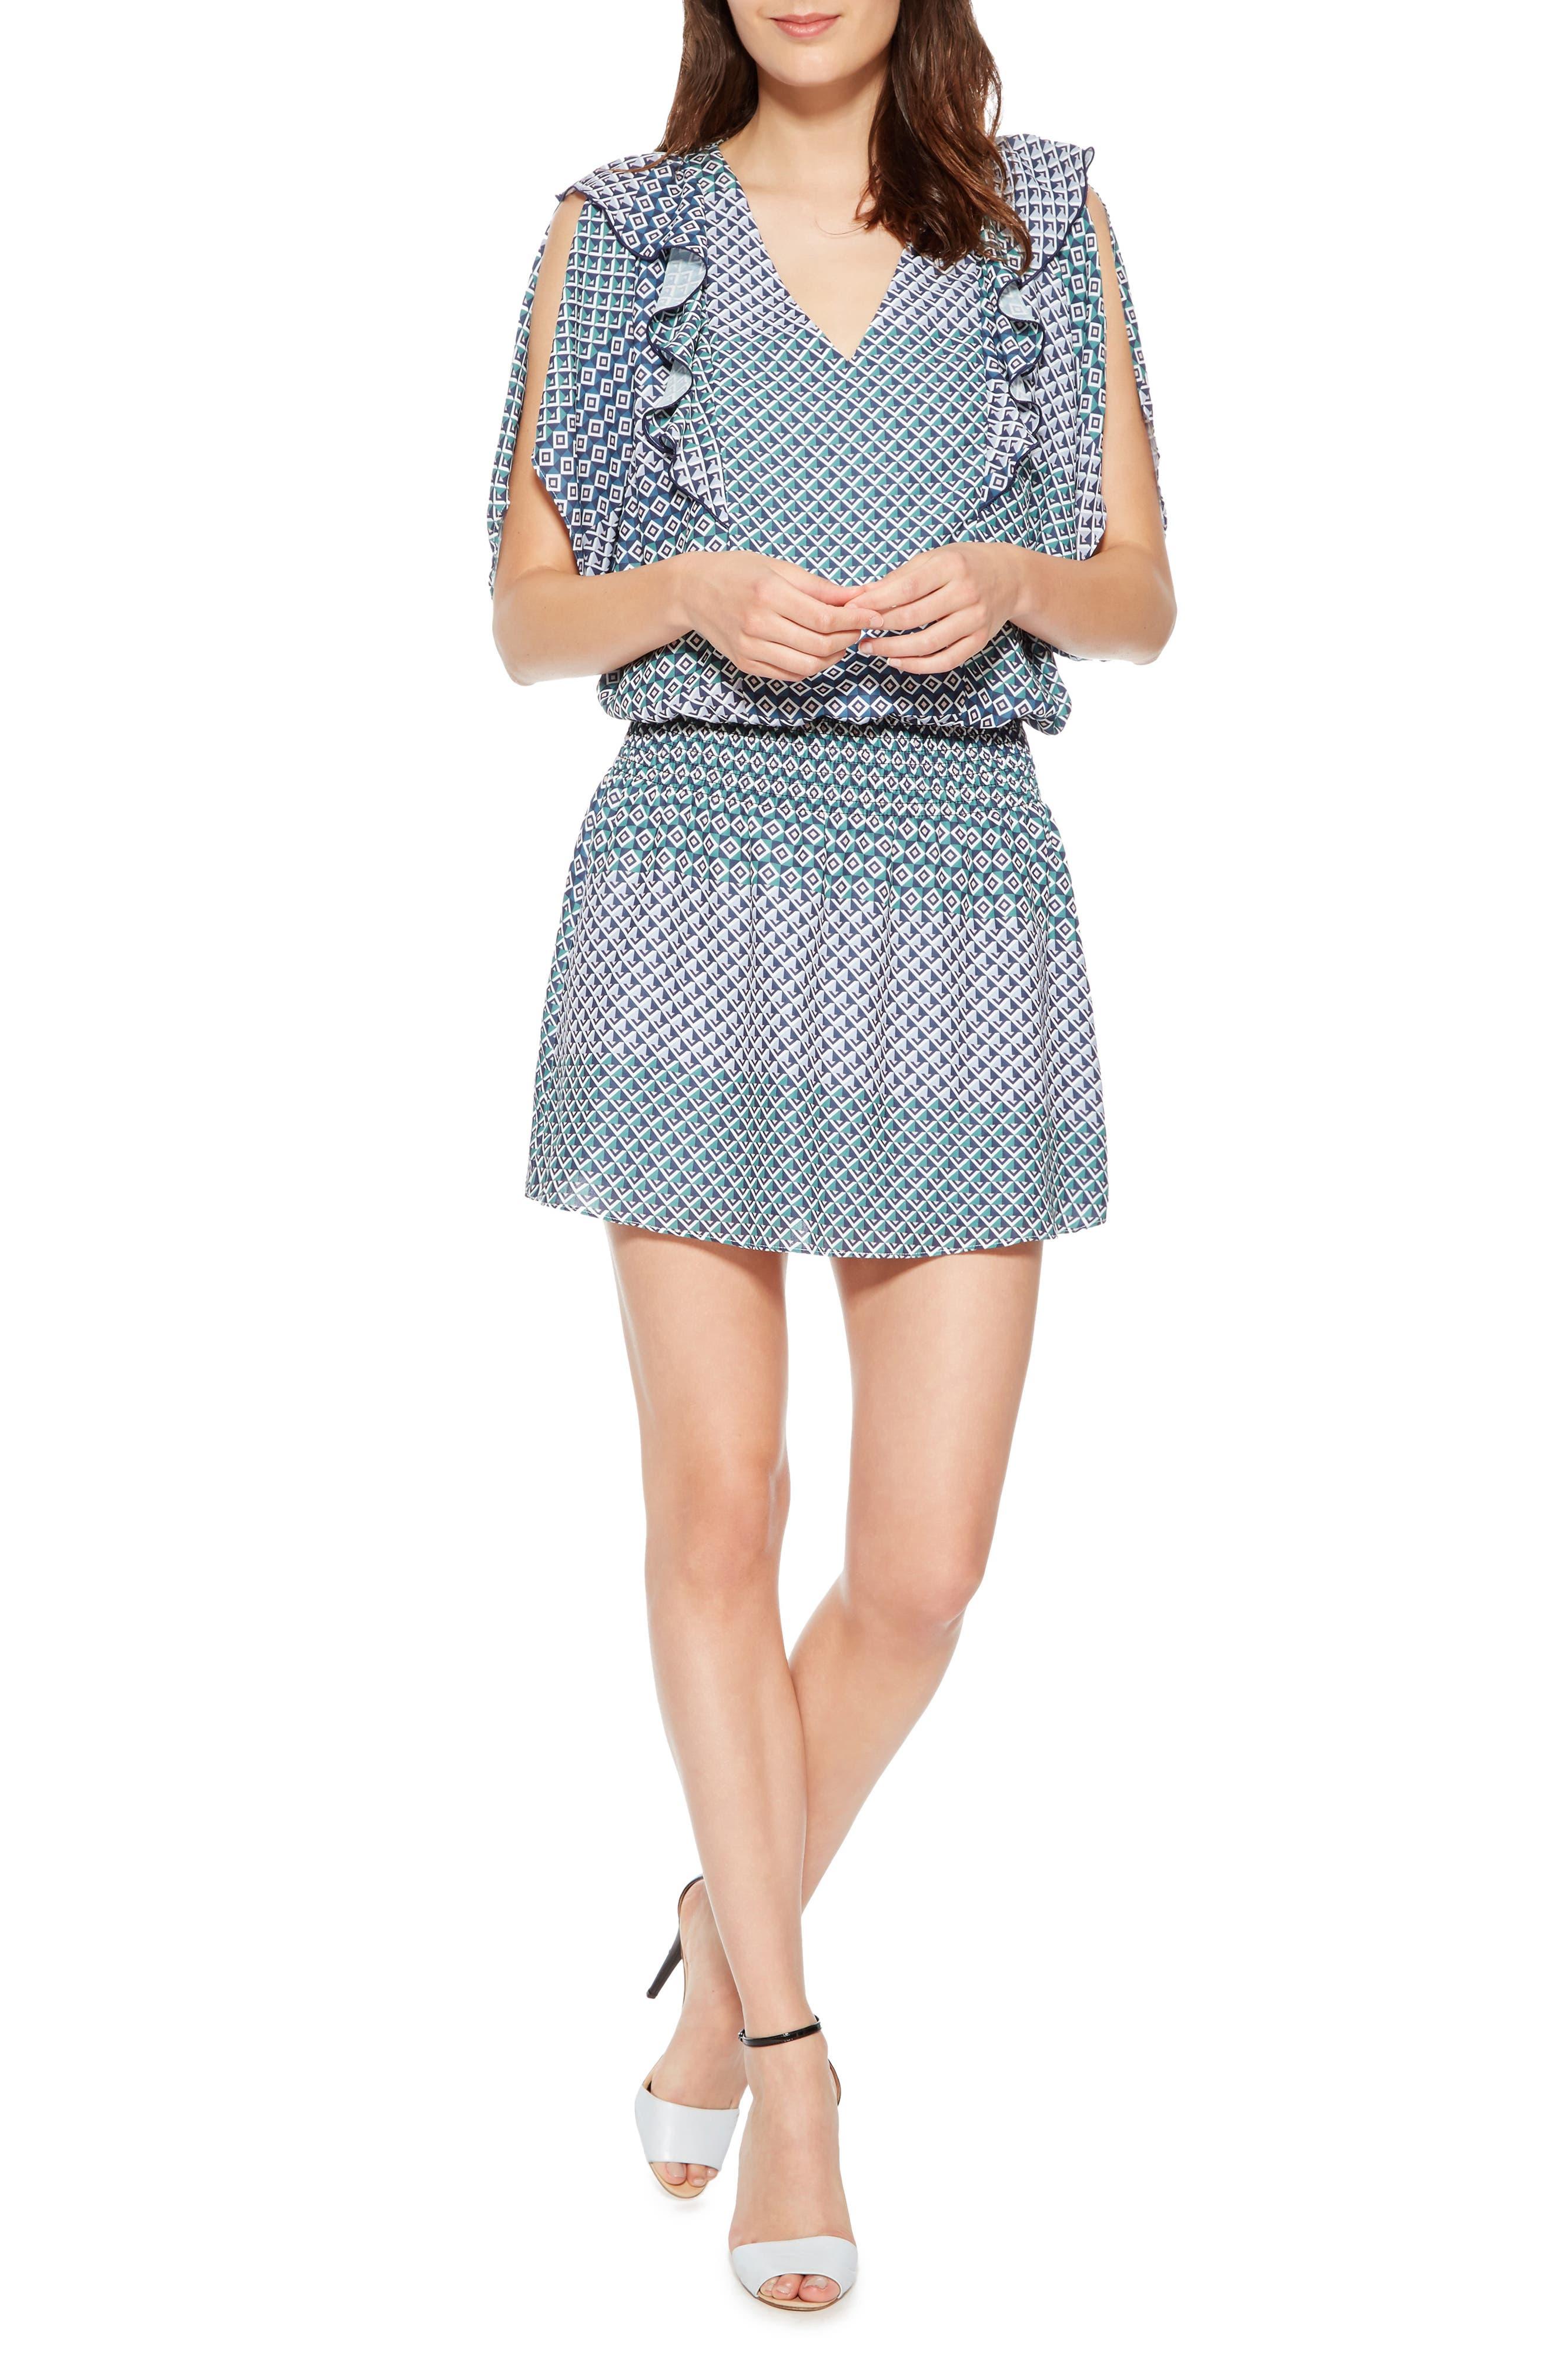 Luisa Print Dress,                         Main,                         color, CESE